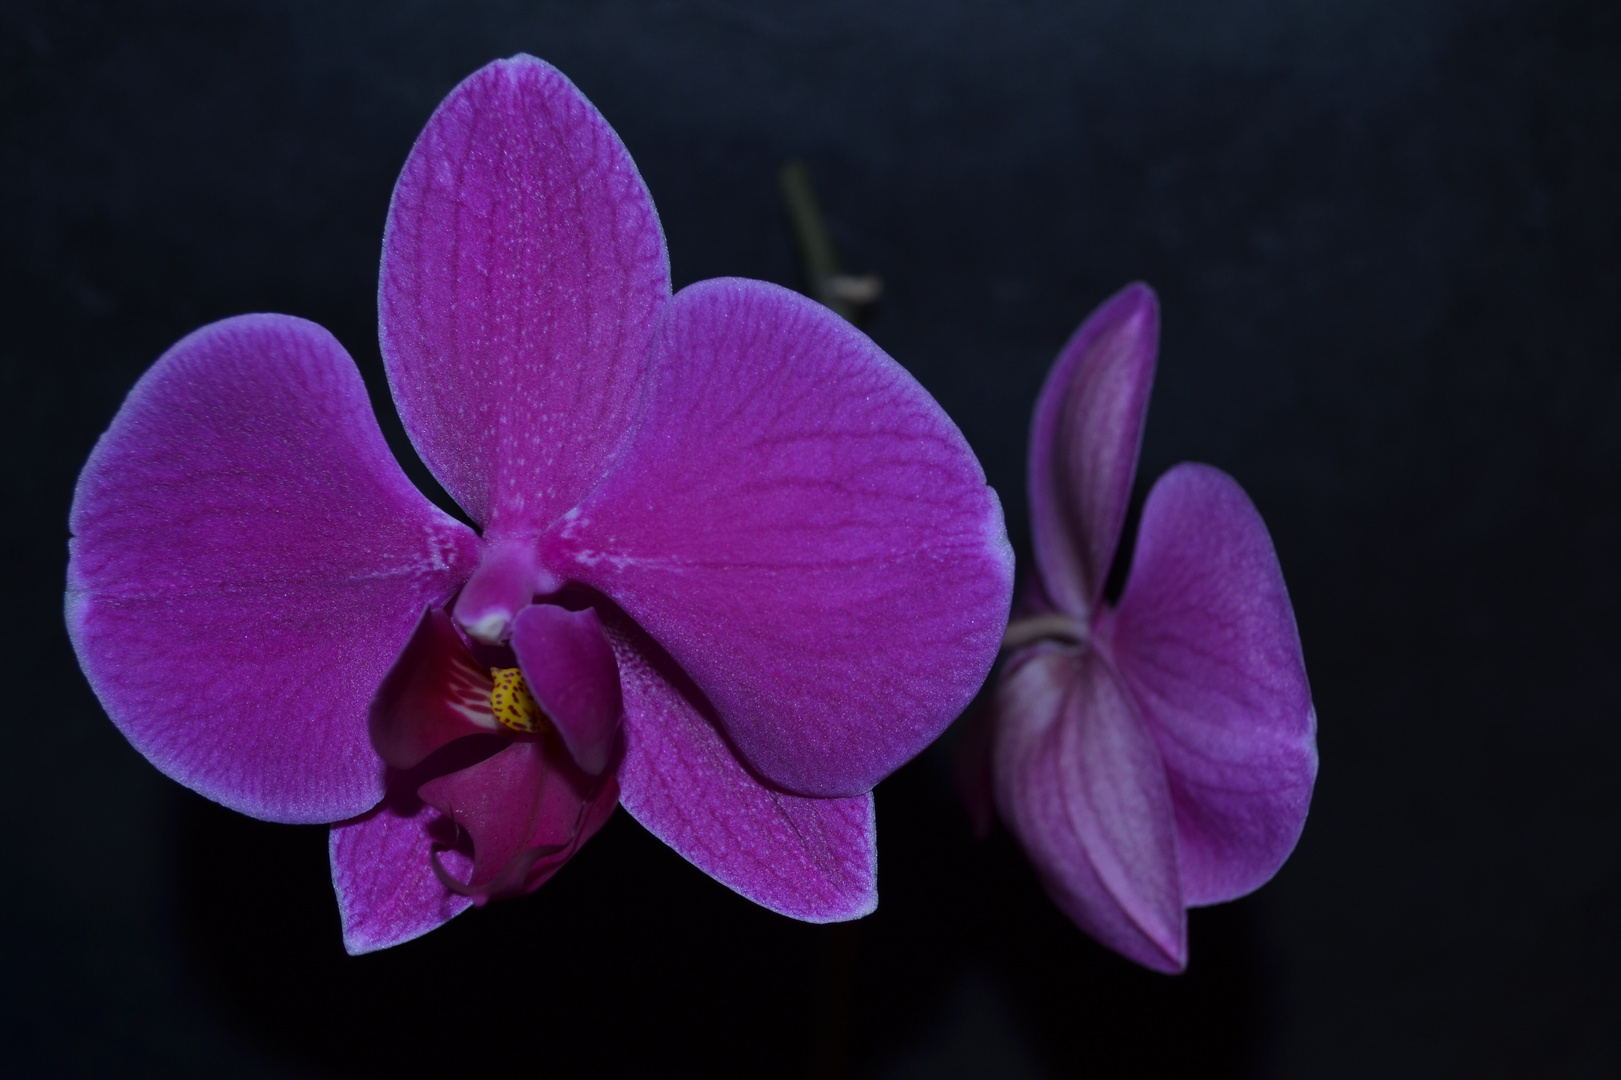 # Orchidee 2 #